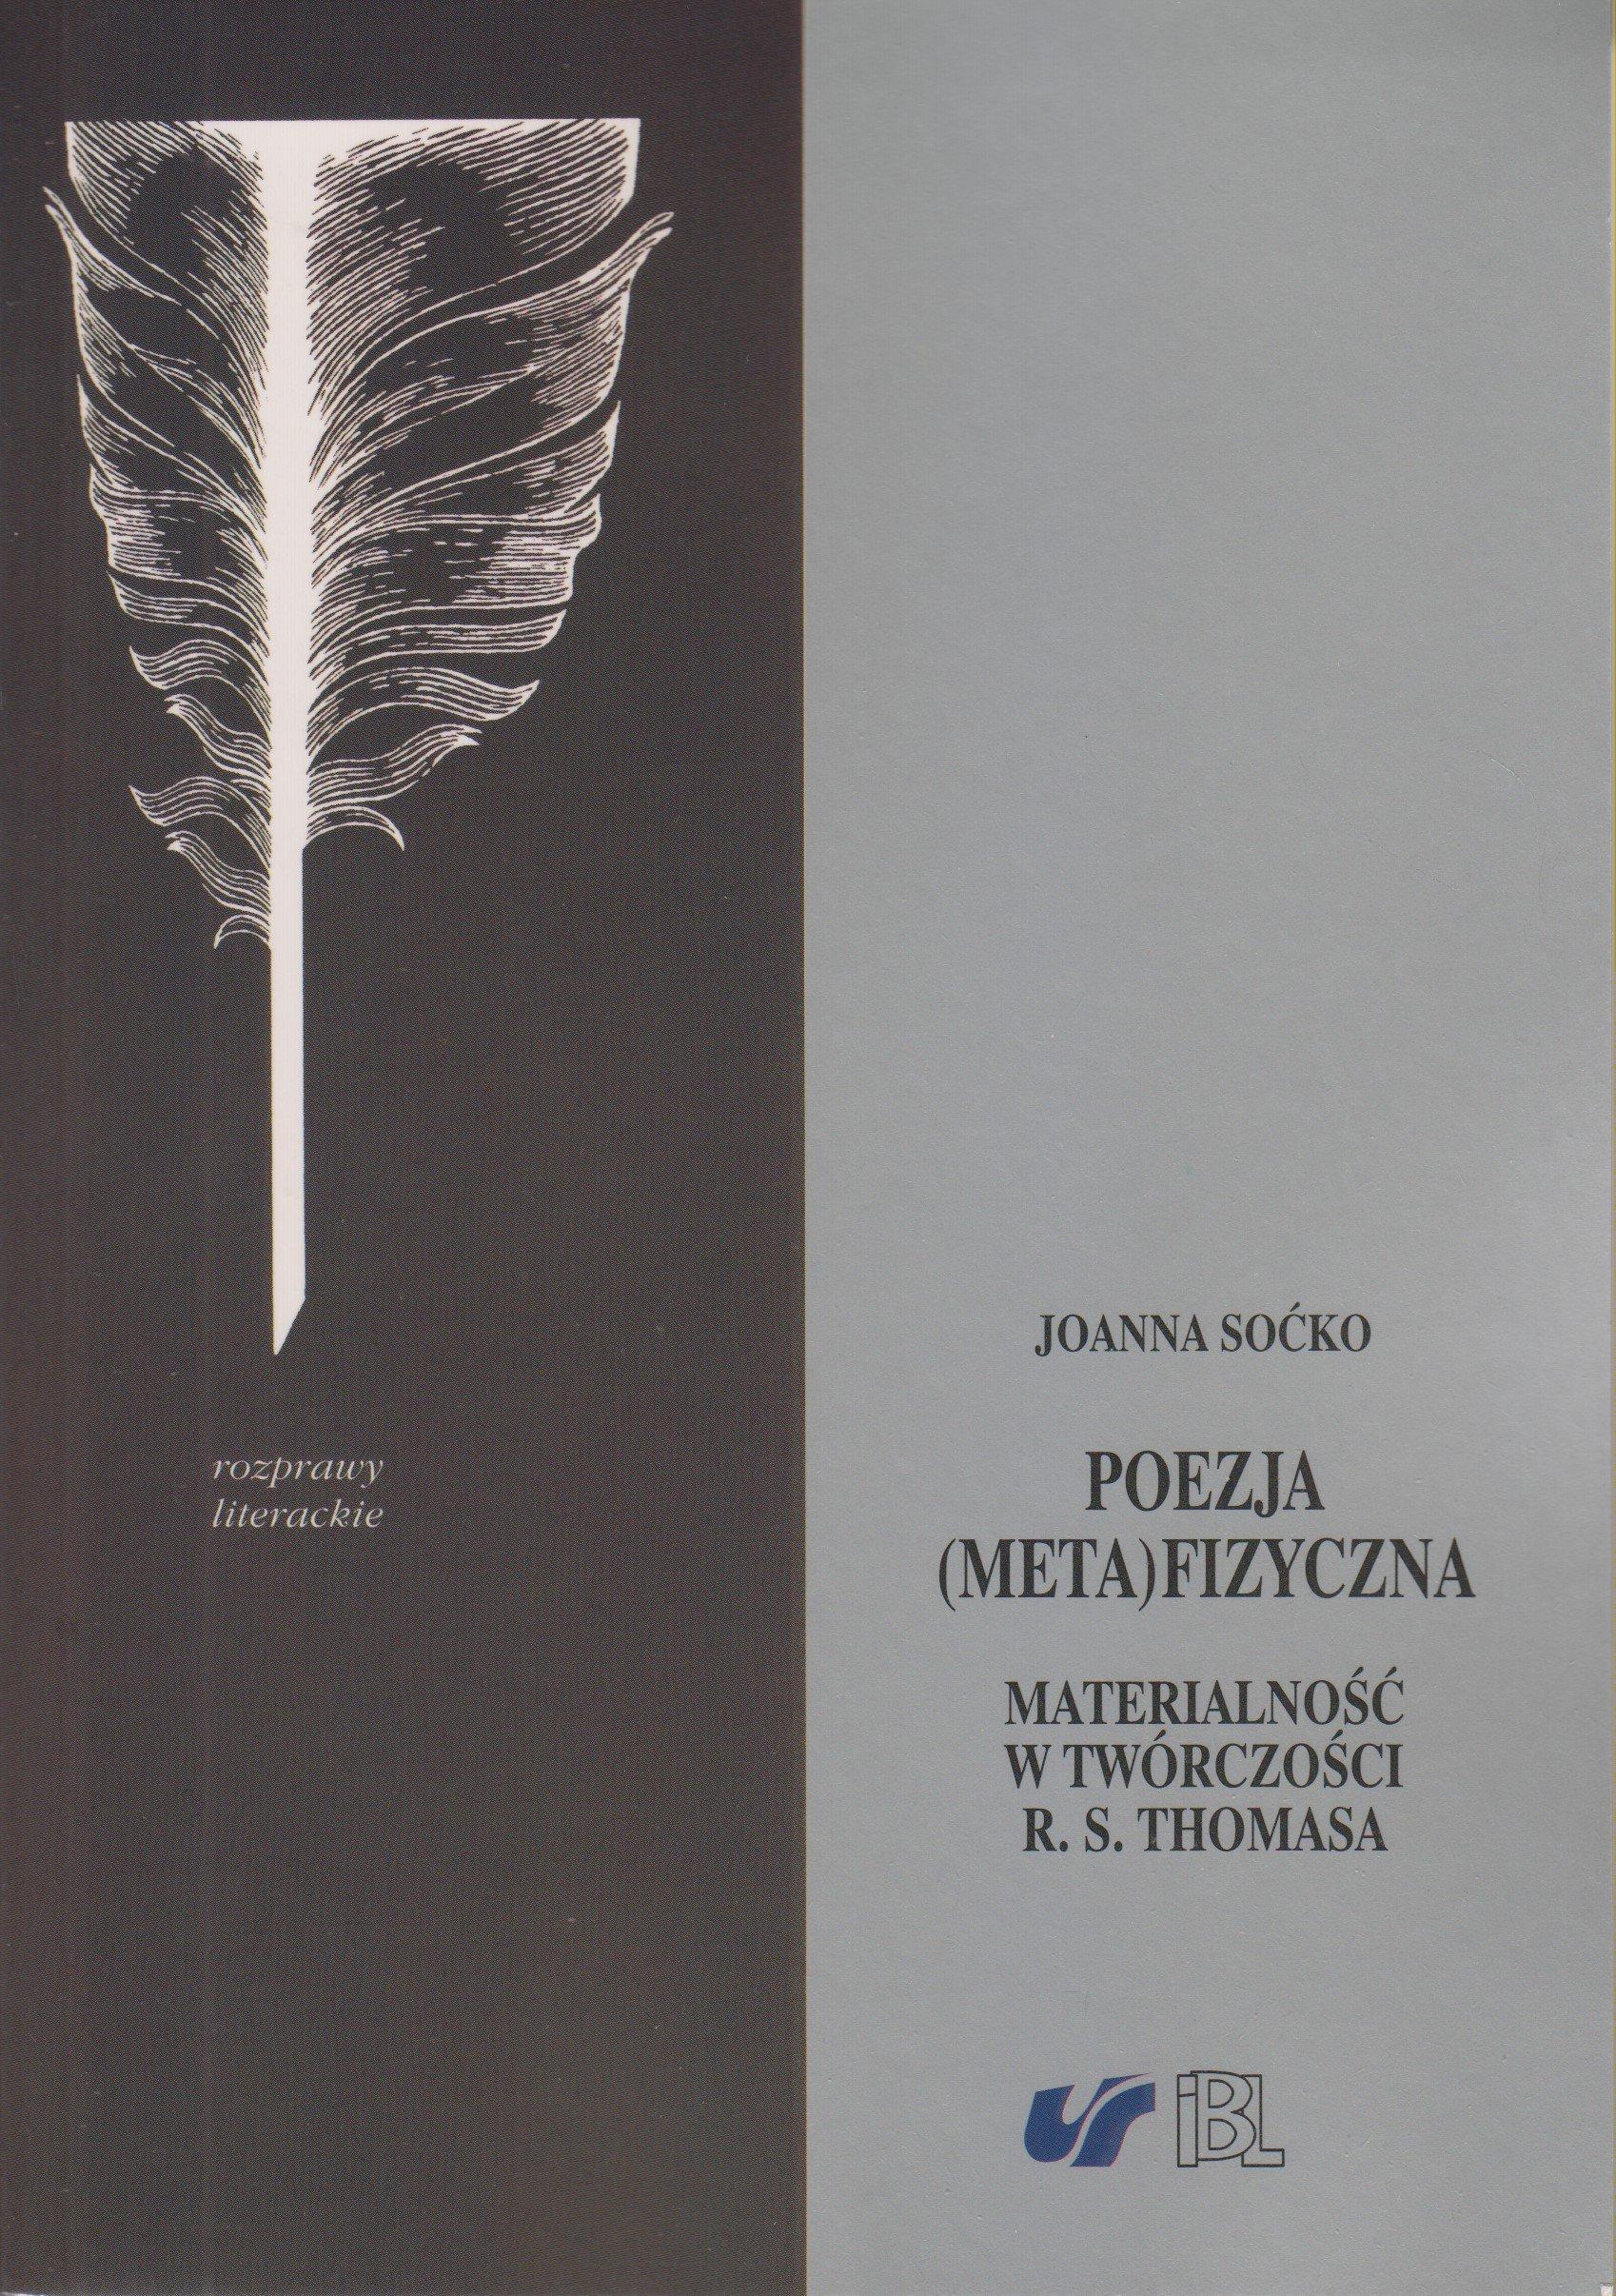 Poezja Metafizyczna Amazones Joanna Socko Libros En